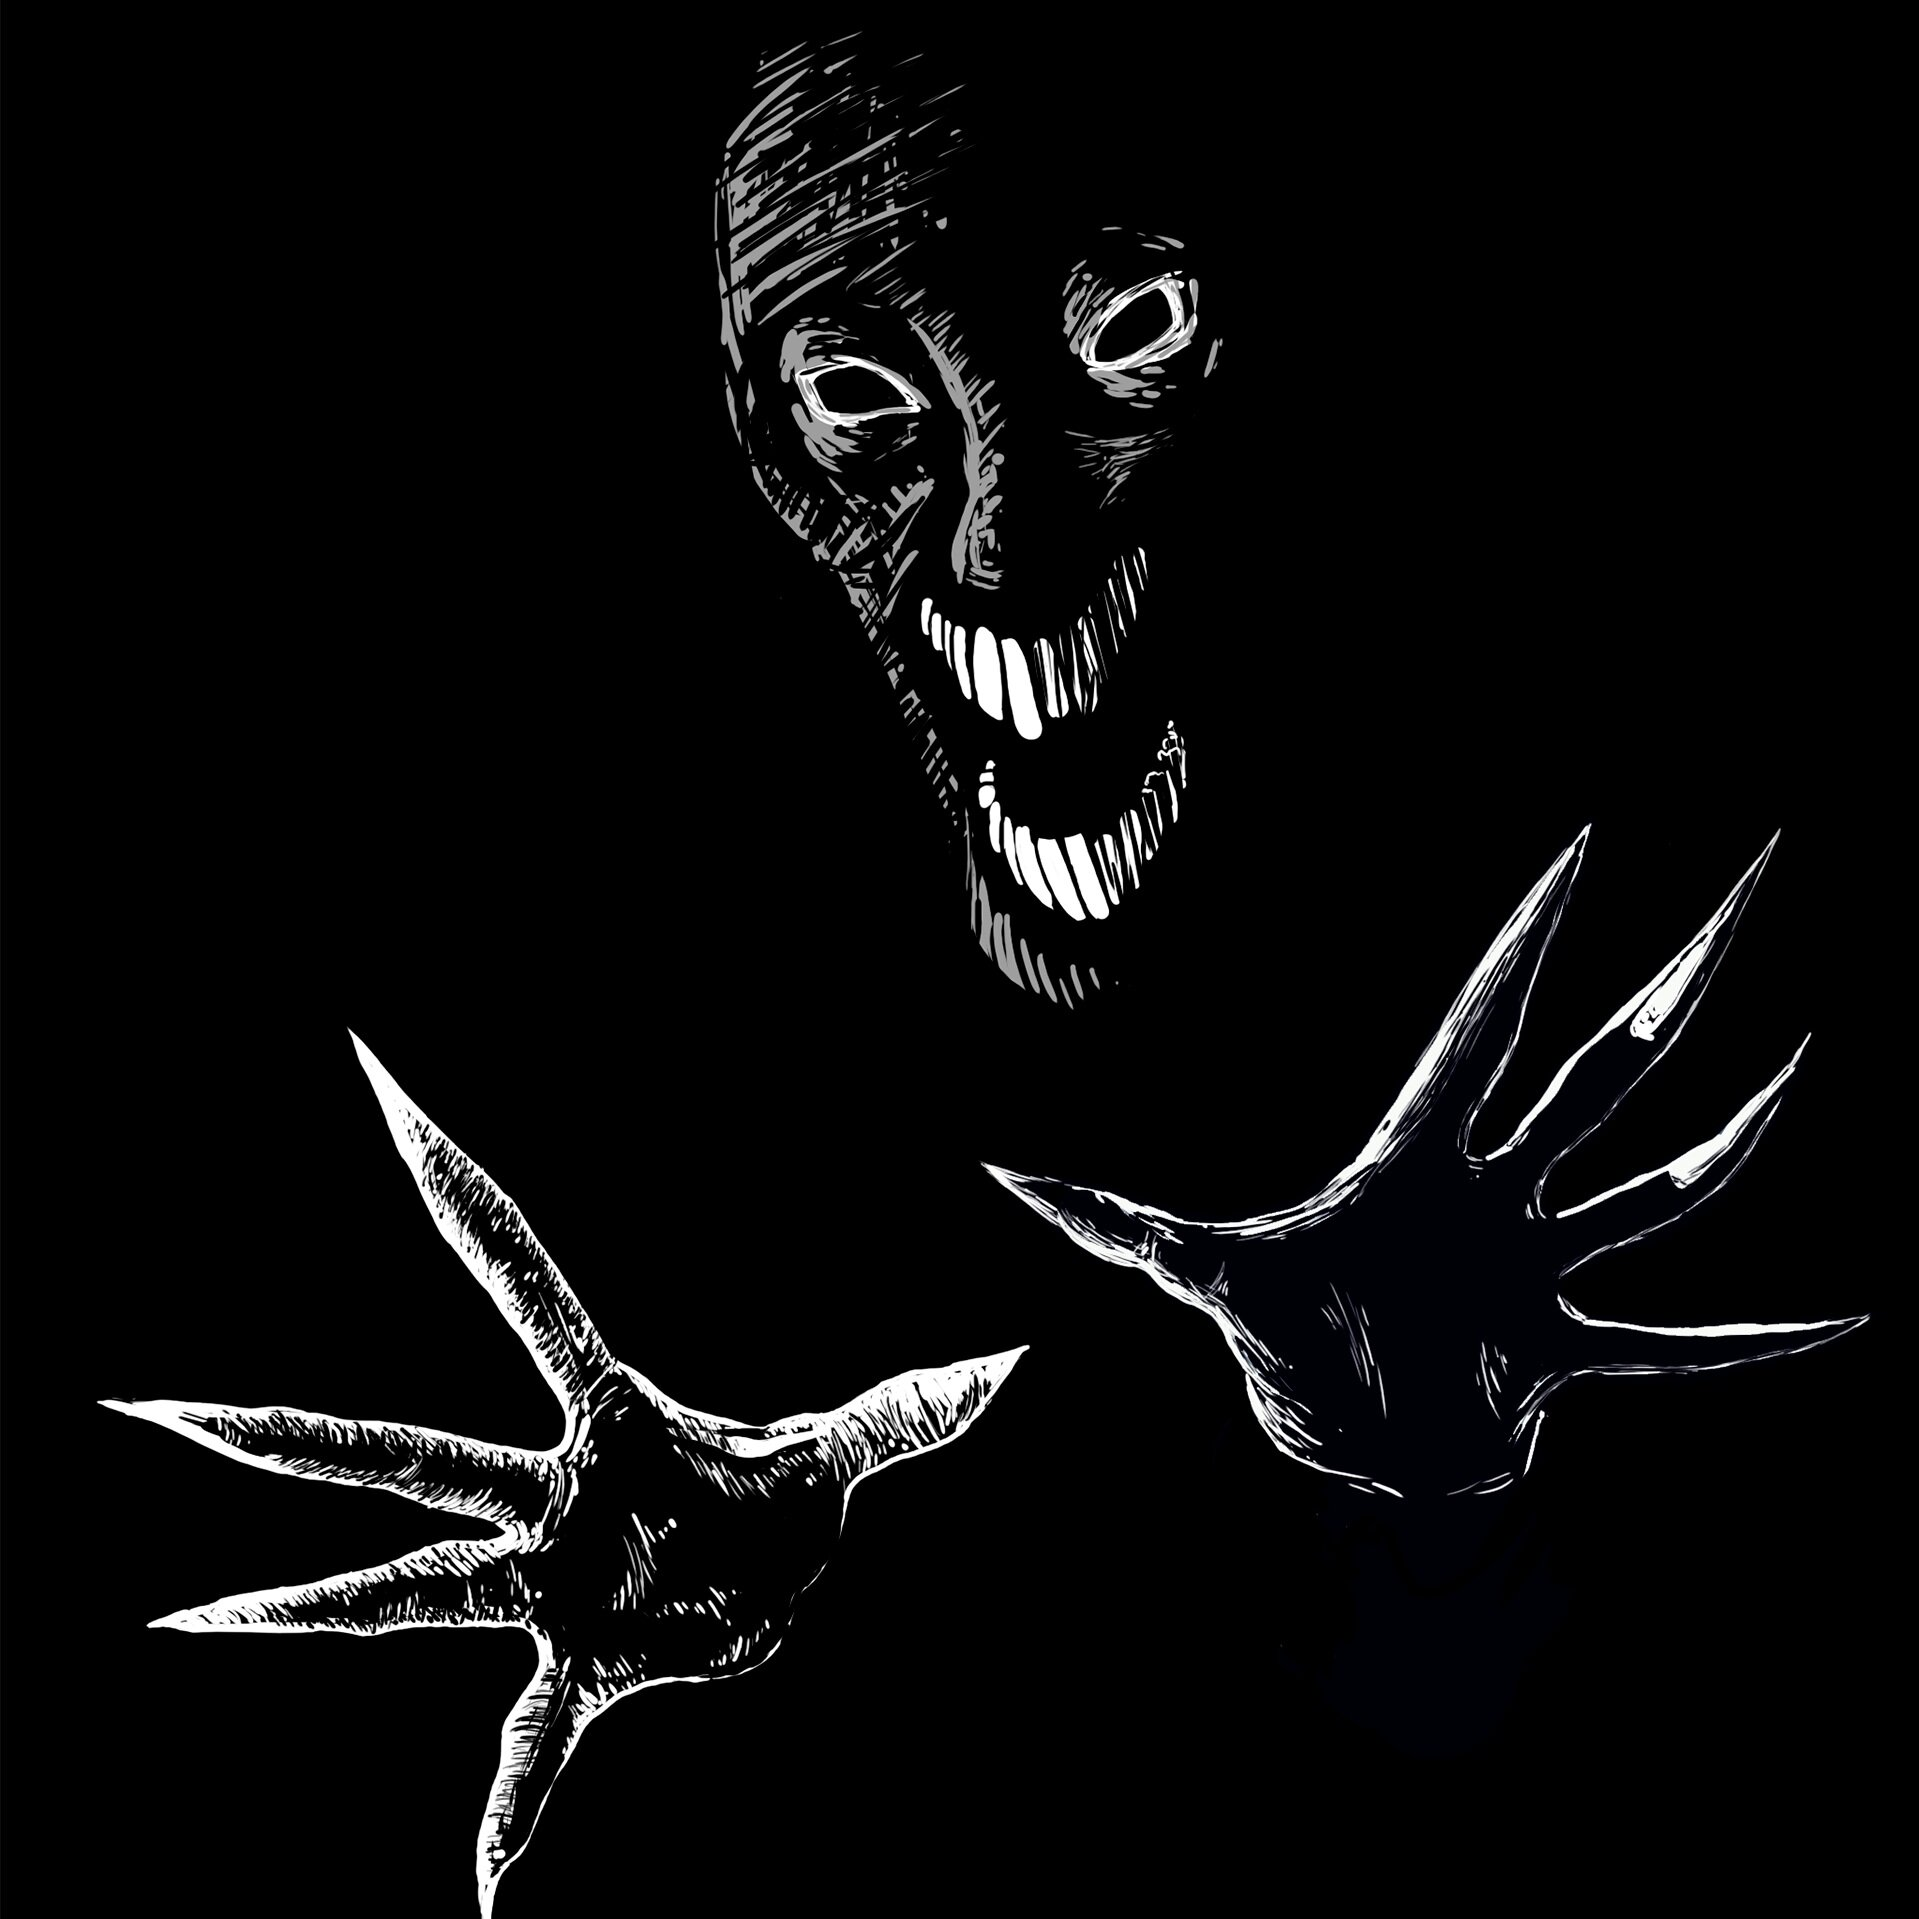 hauntAR.jpg